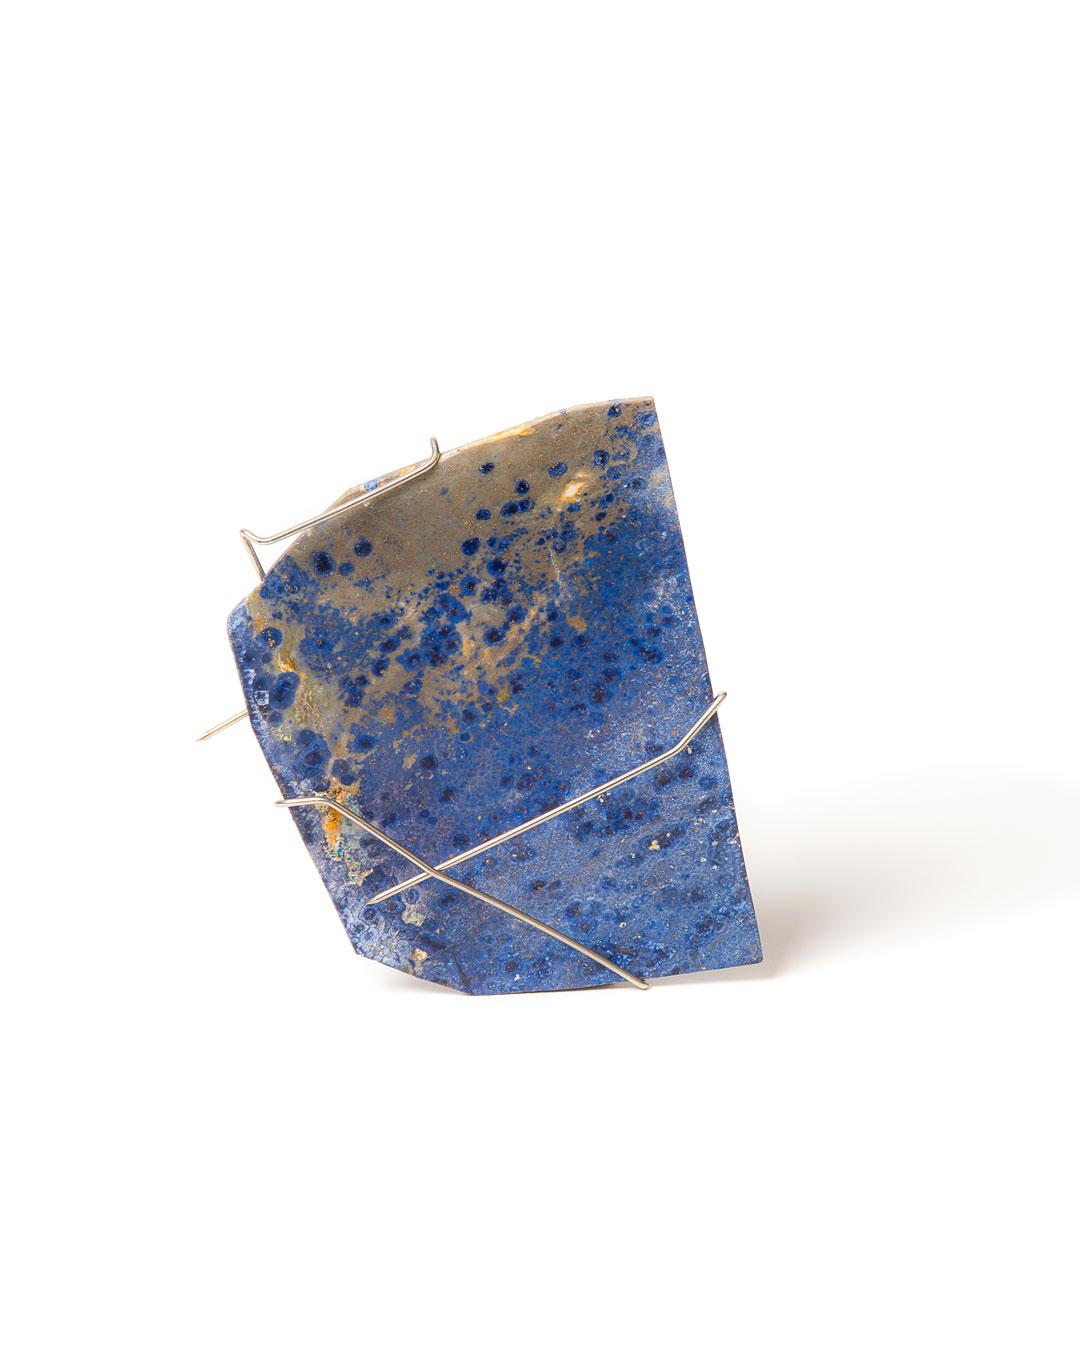 Rudolf Kocéa, Aura, 2019, brooch; sodalite, stainless steel, 130 x 100 x 5 mm, €1250